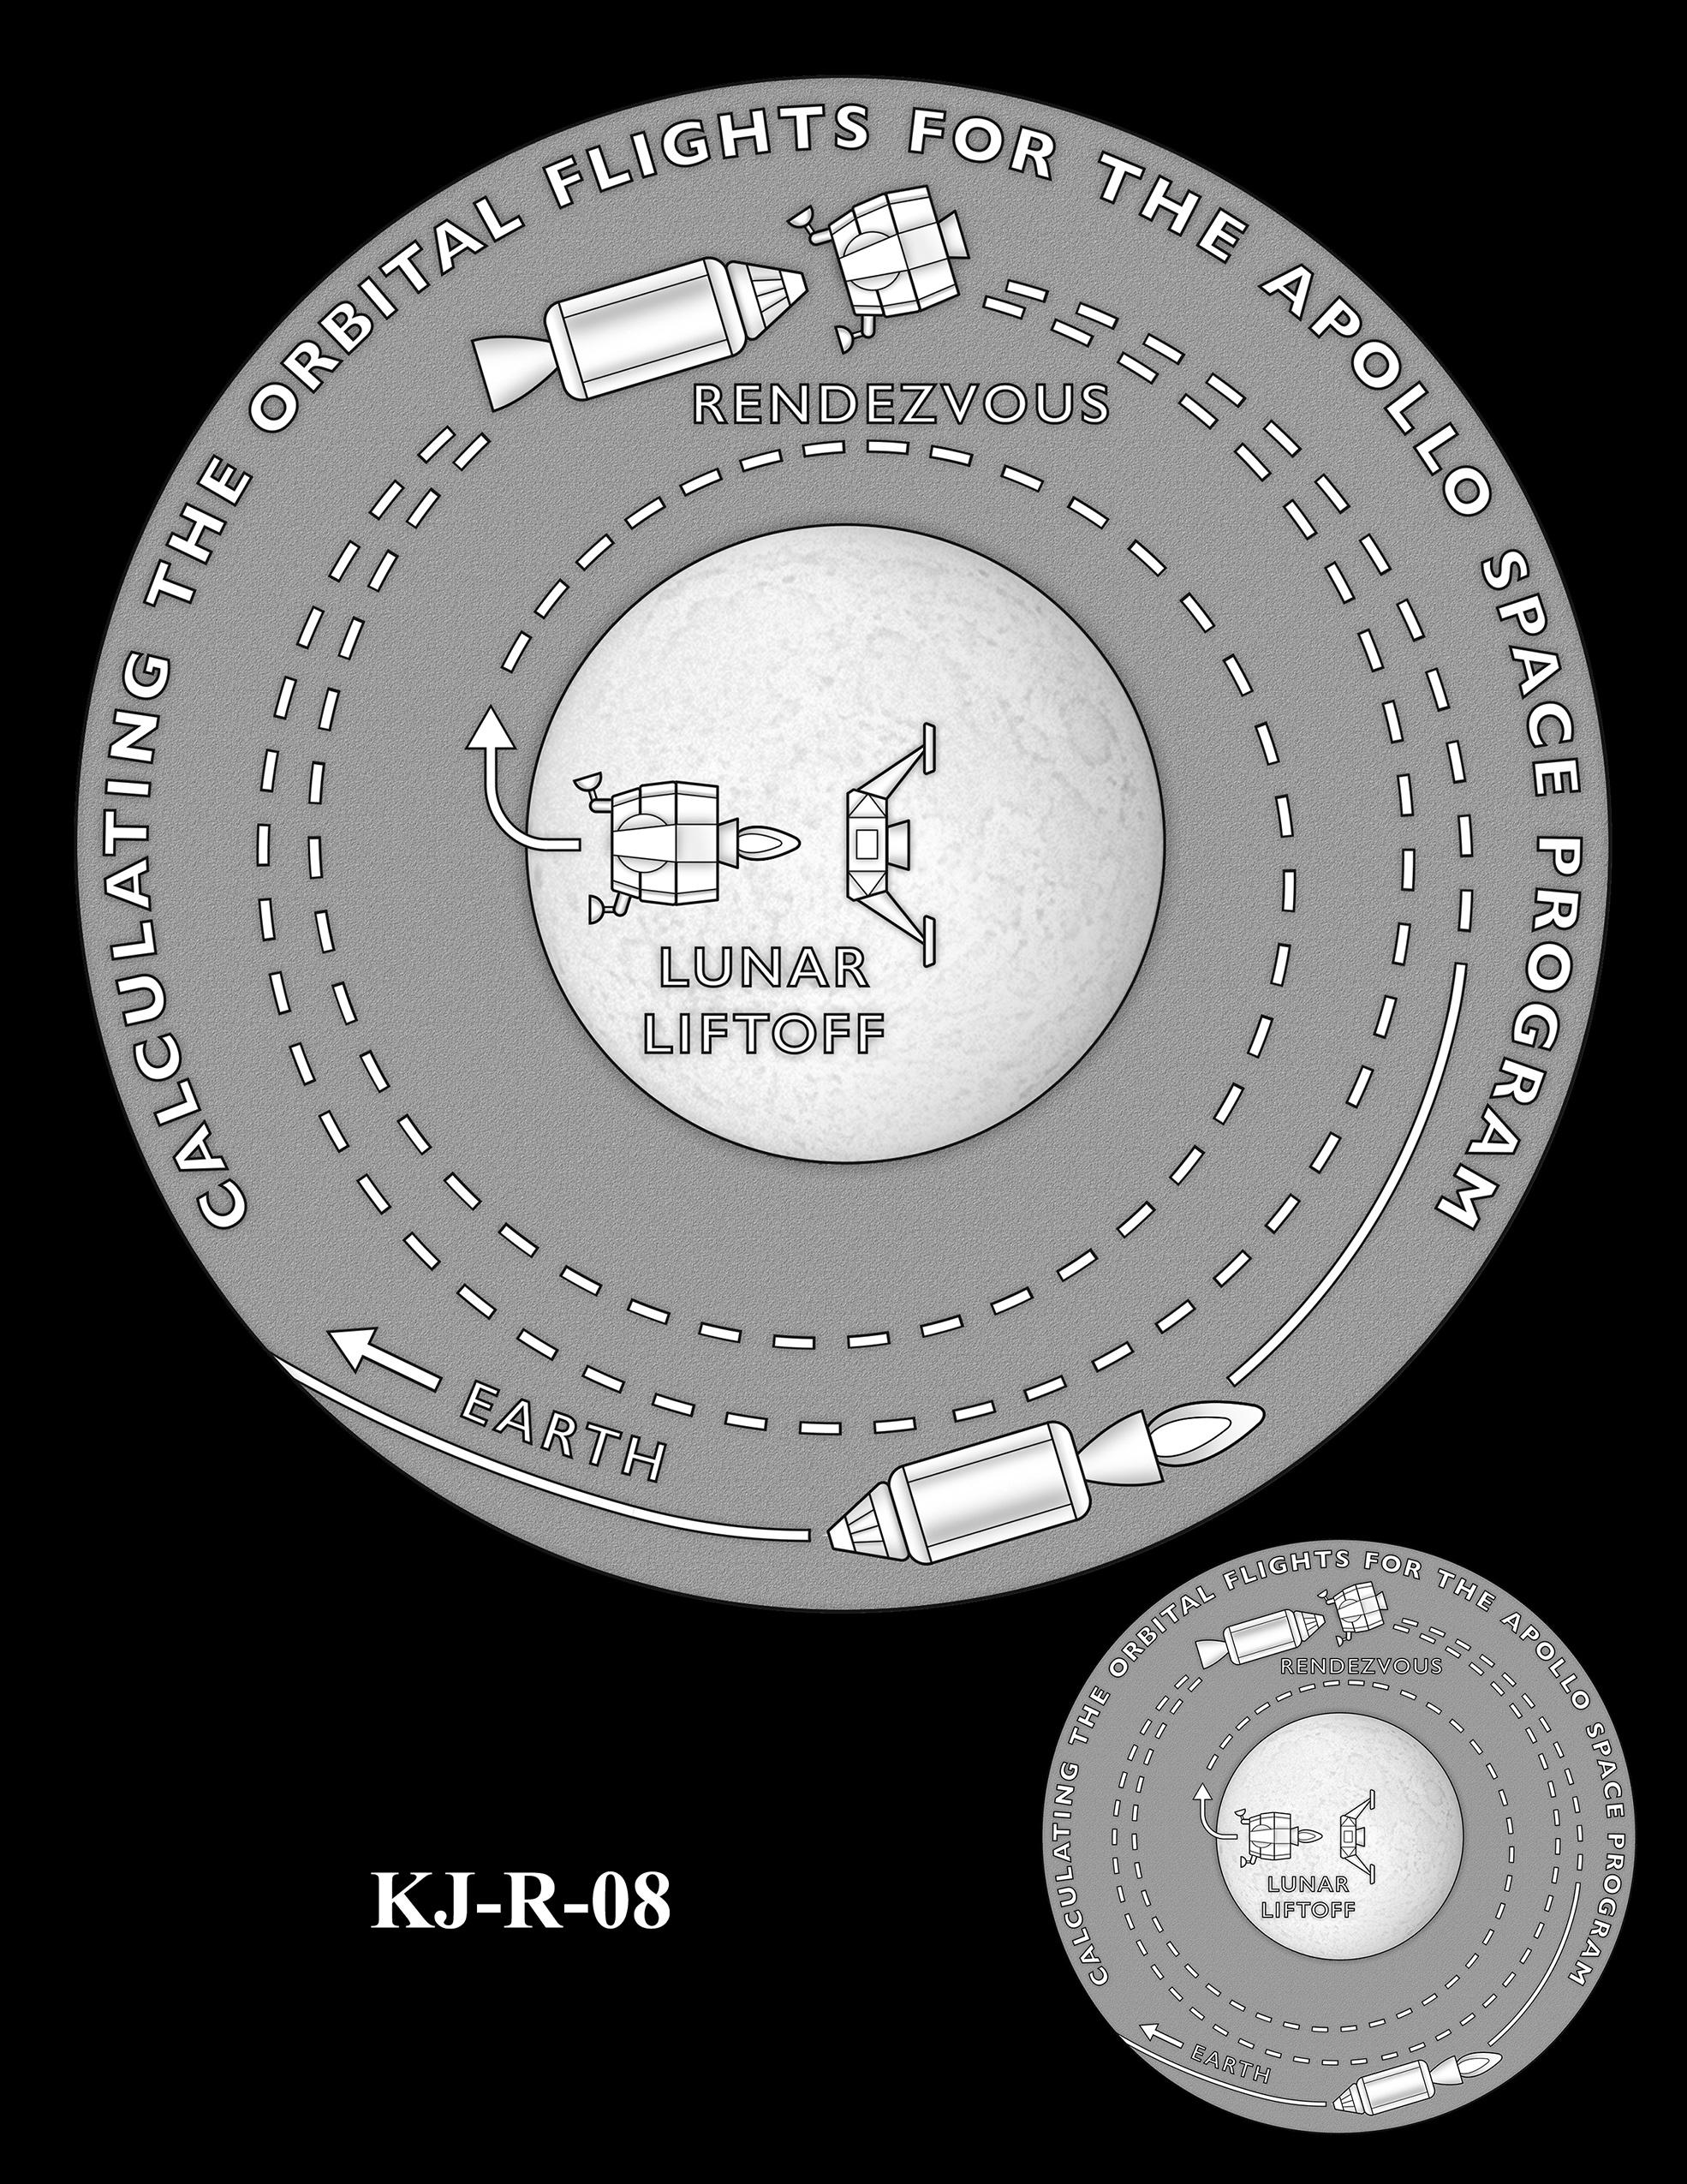 KJ-R-08 -- Katherine Johnson Congressional Gold Medal